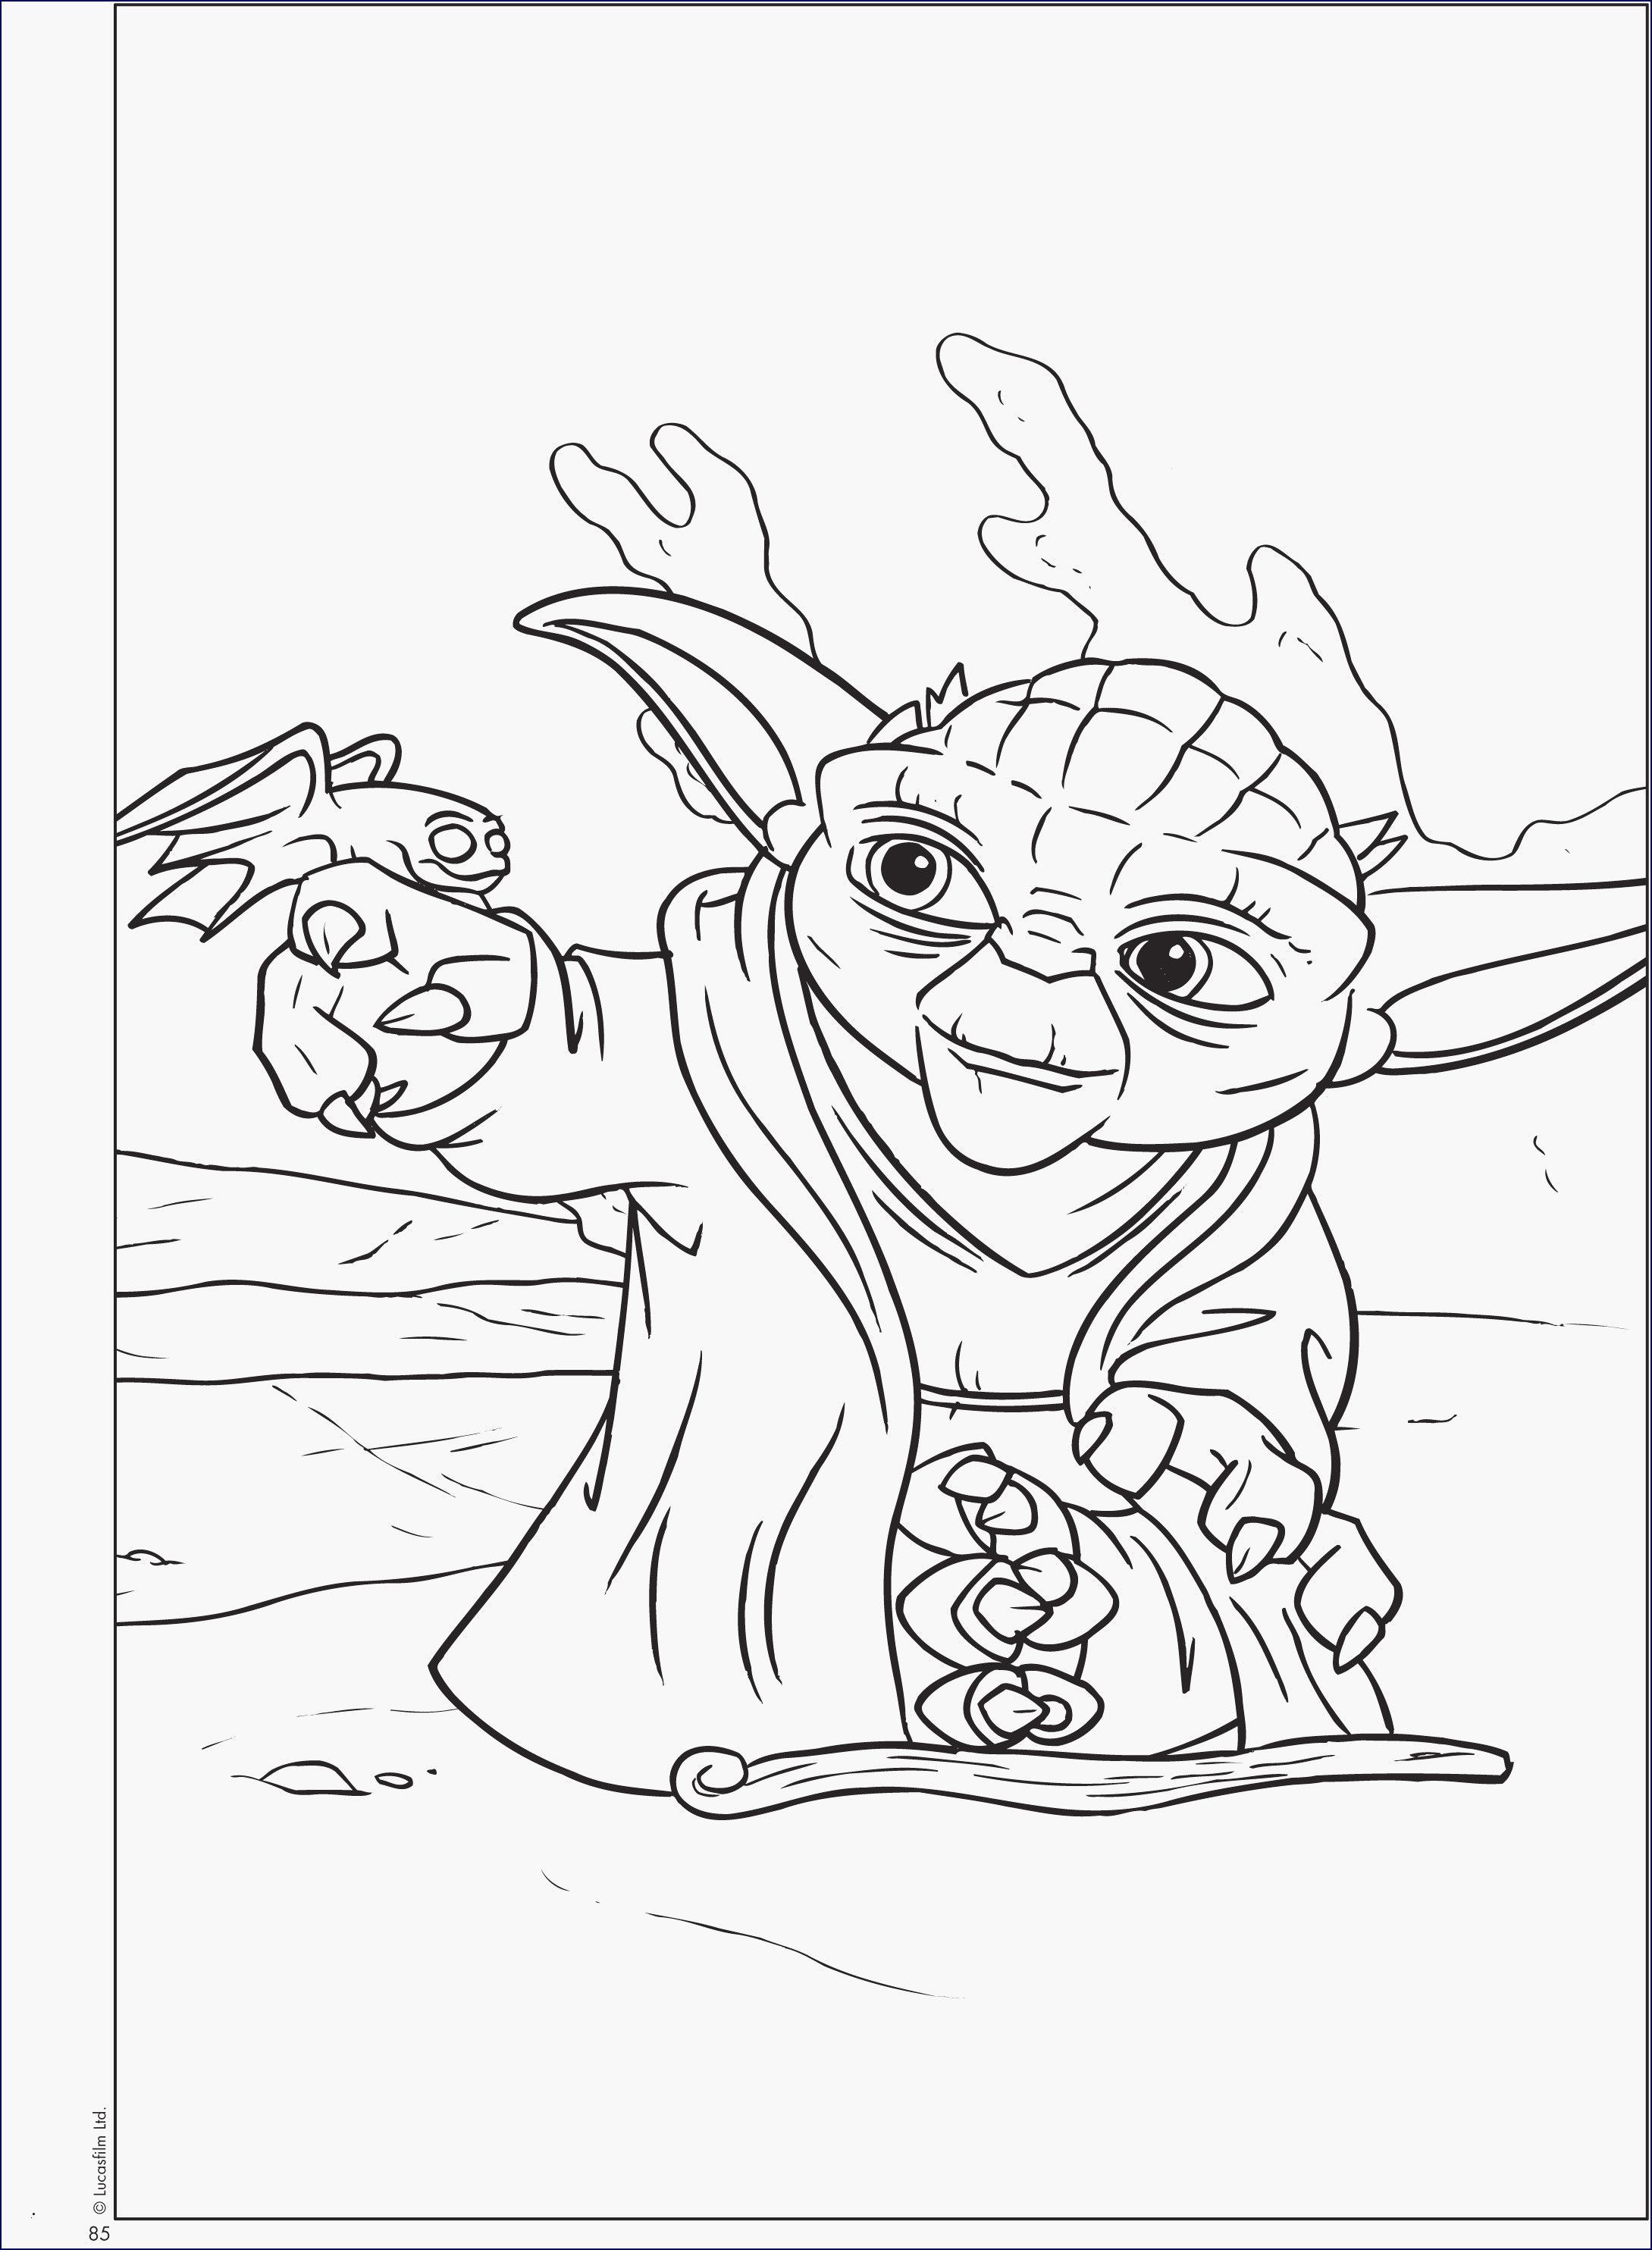 Boba Fett Ausmalbilder Inspirierend 36 Idee Timon Und Pumbaa Ausmalbilder Treehouse Nyc Stock